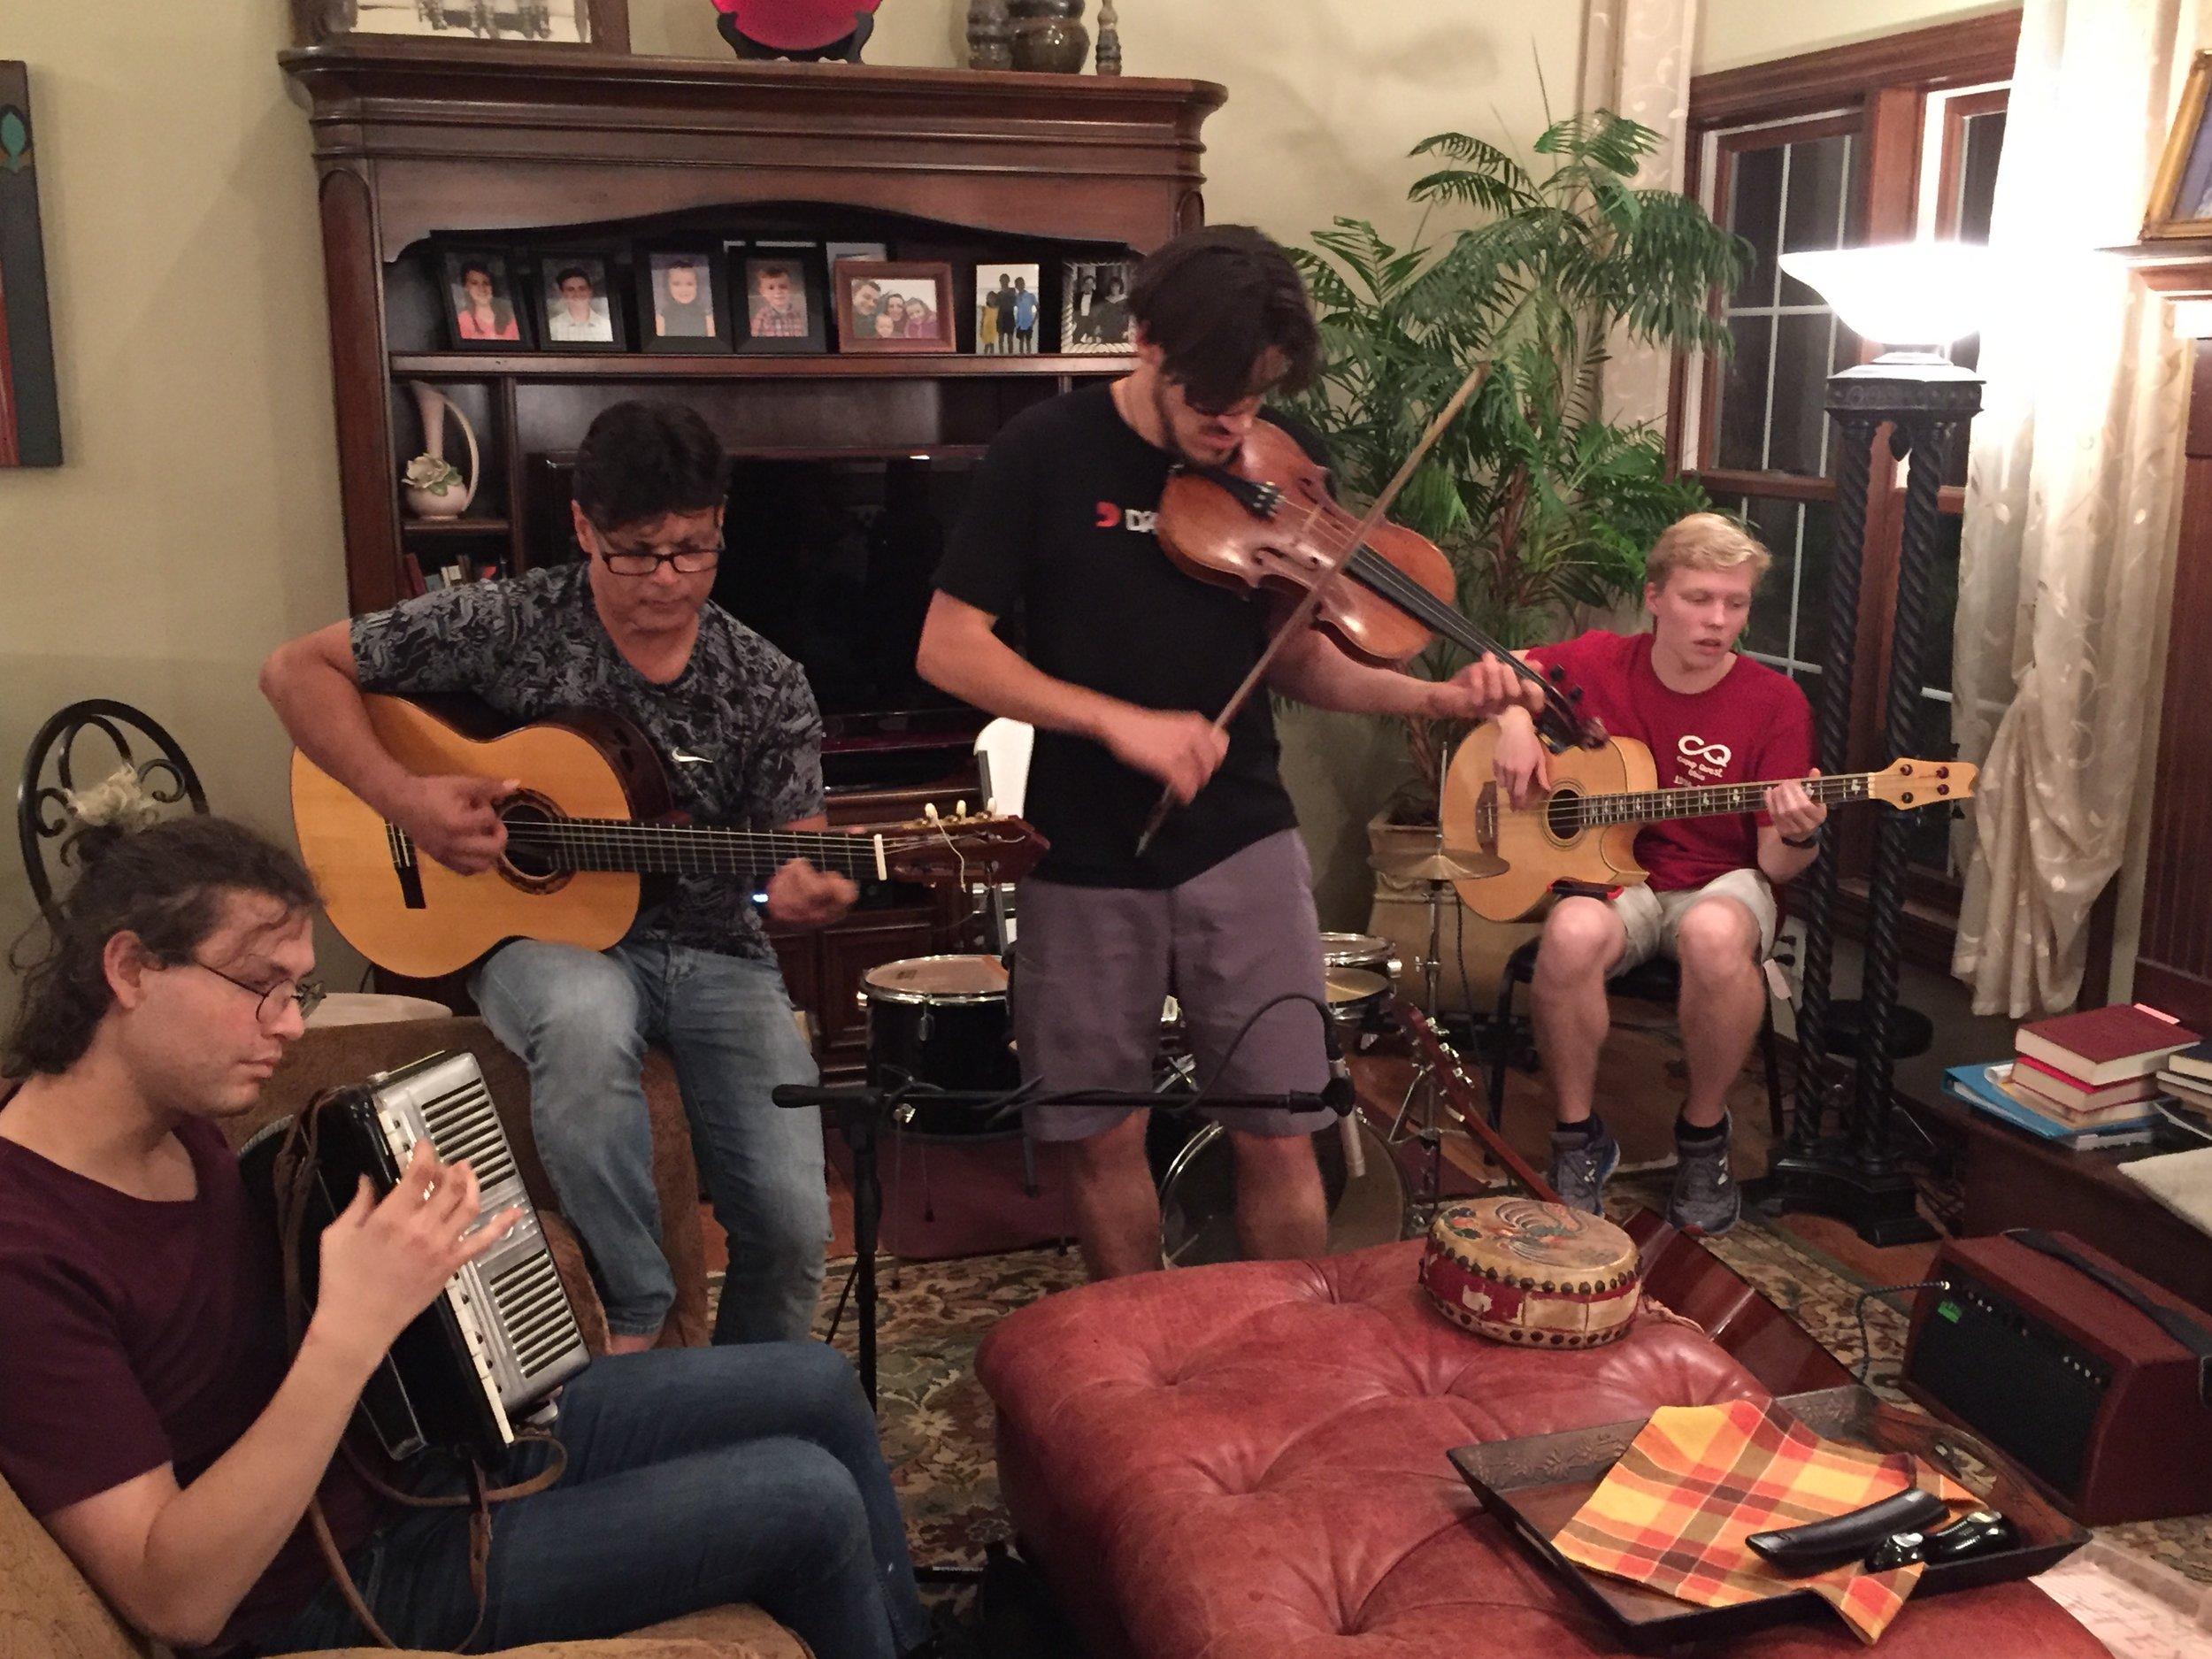 Julia, Mir, Mohit and Aidan